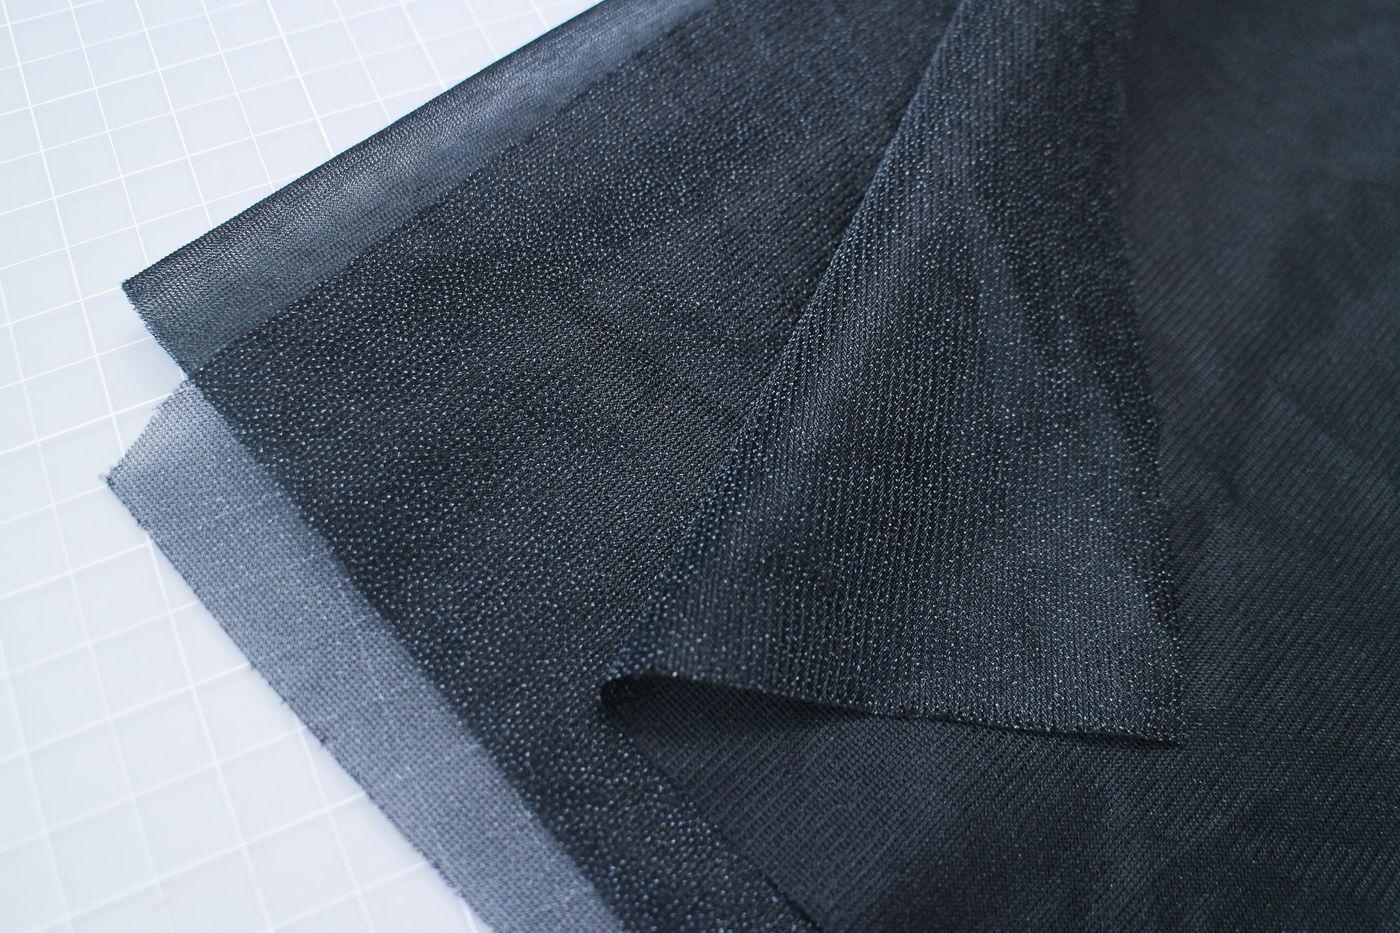 Fuse the Fabric